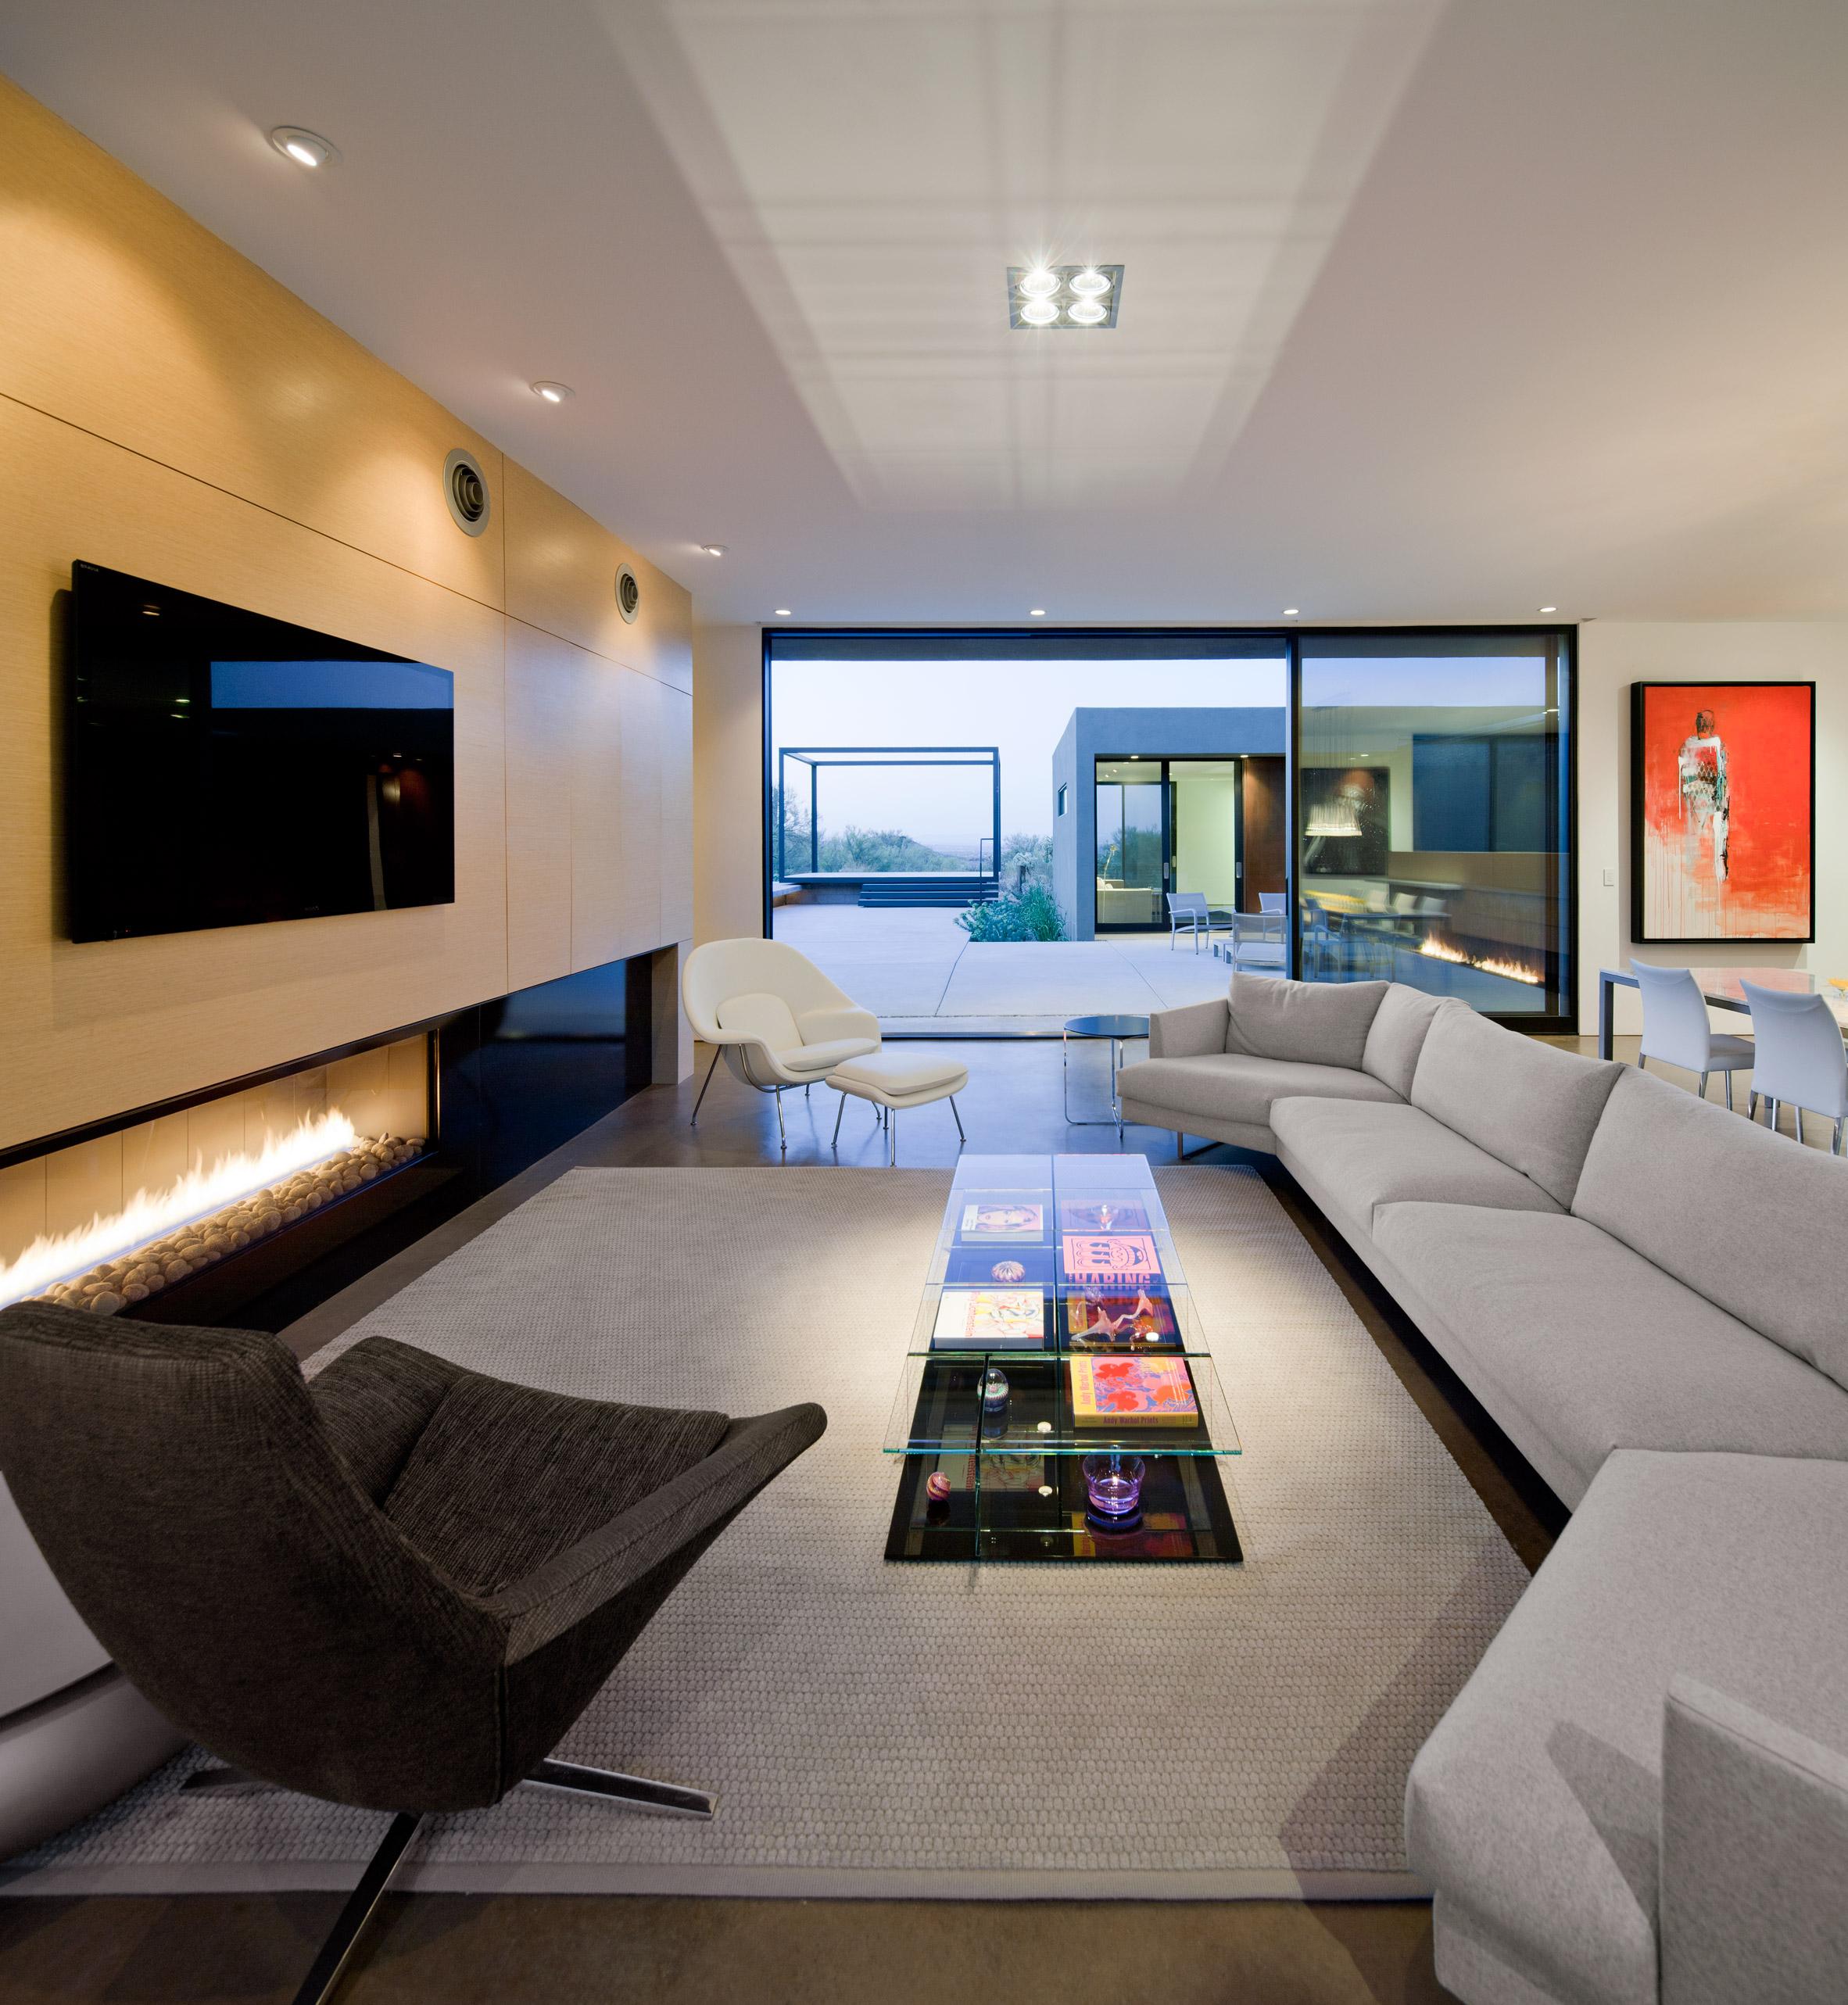 levin-residence-arizona-5.jpg